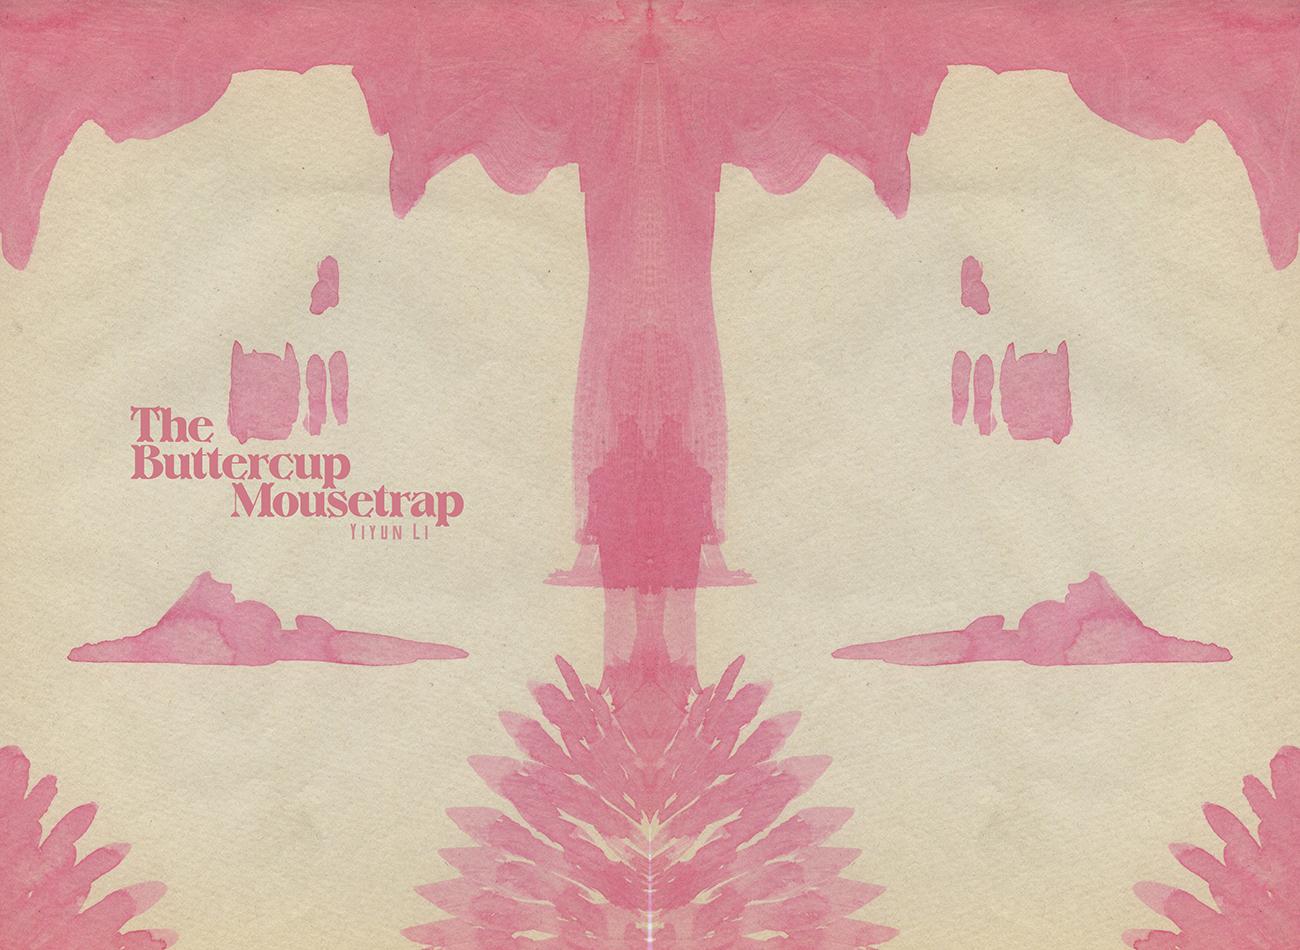 Story artwork by guest designer Tunde Adebimpe